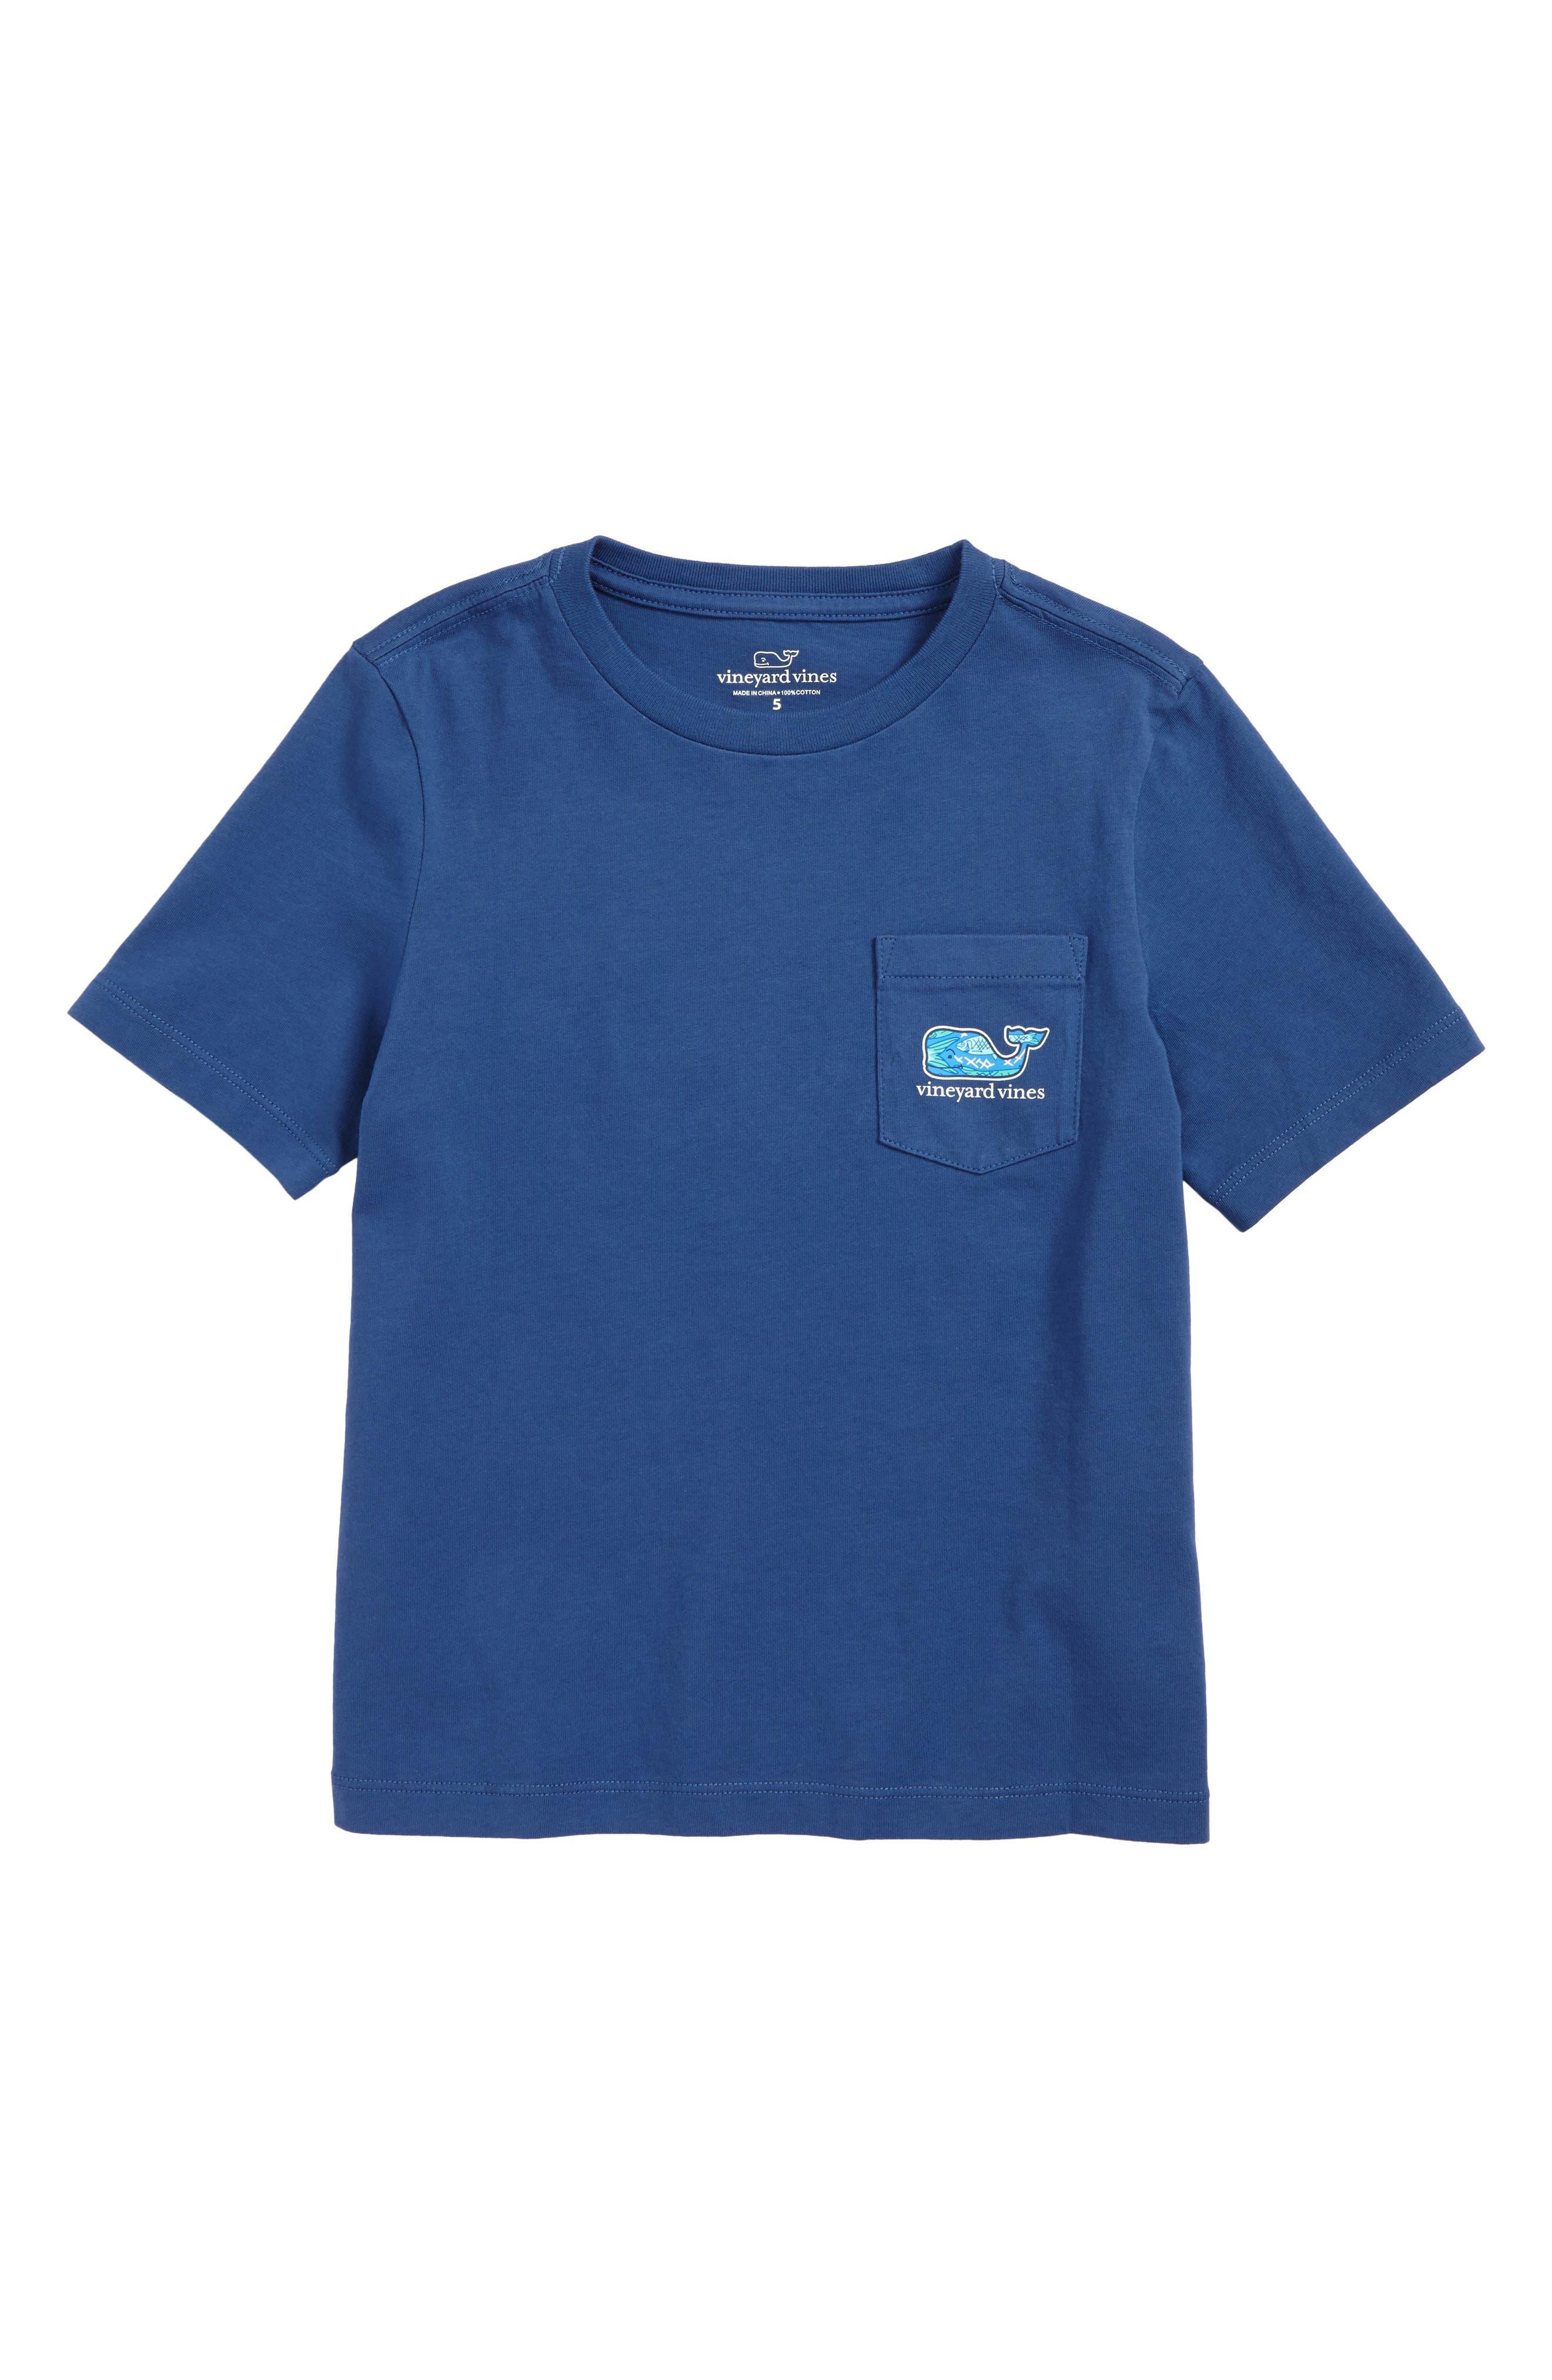 Main Image - vineyard vines Fish Scales Whale Pocket T-Shirt (Toddler Boys & Little Boys)